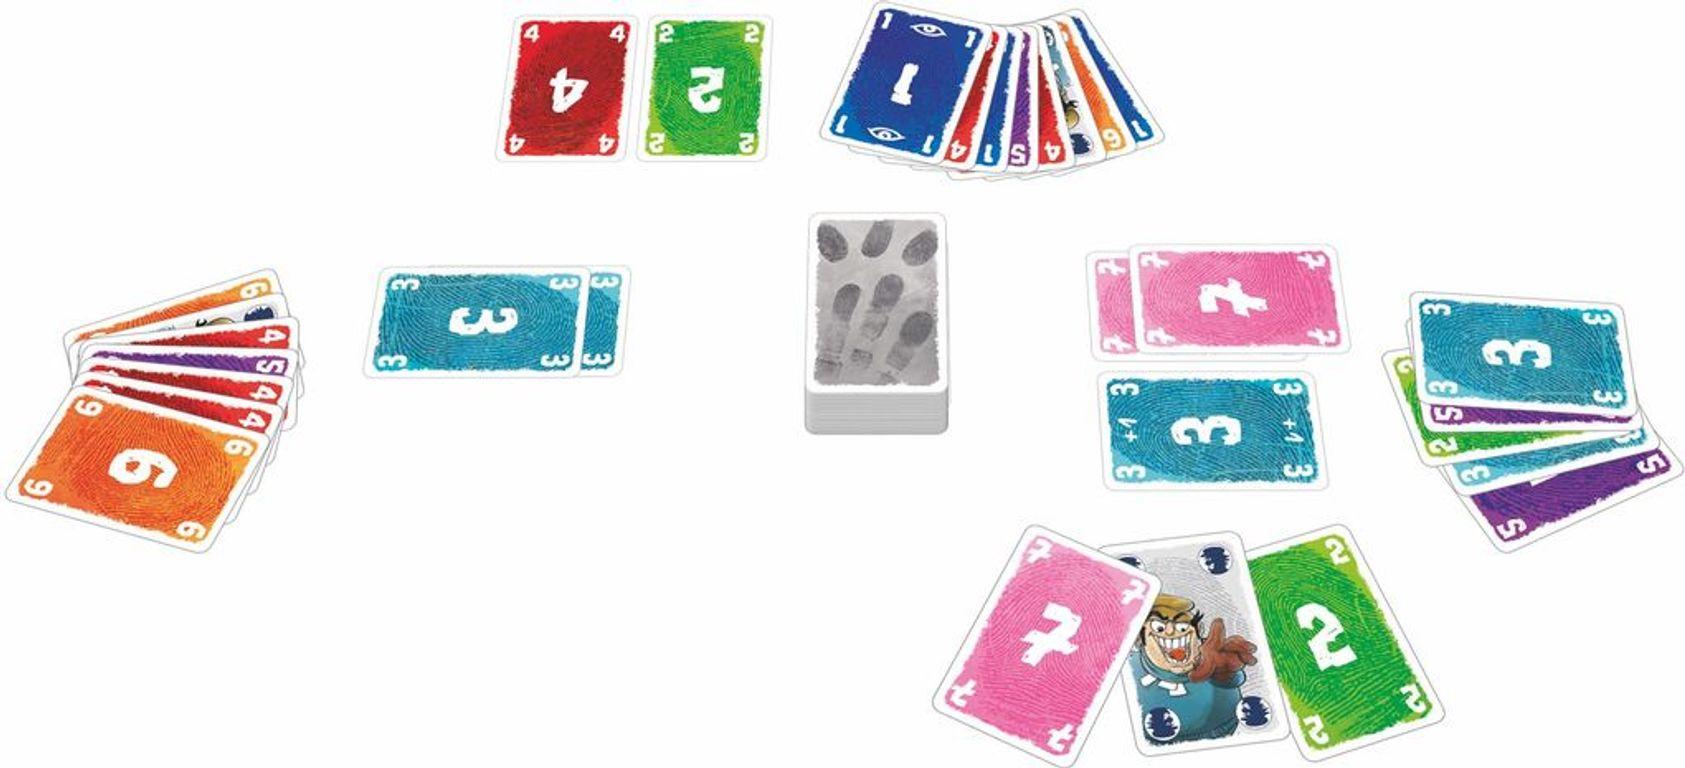 Gier cards